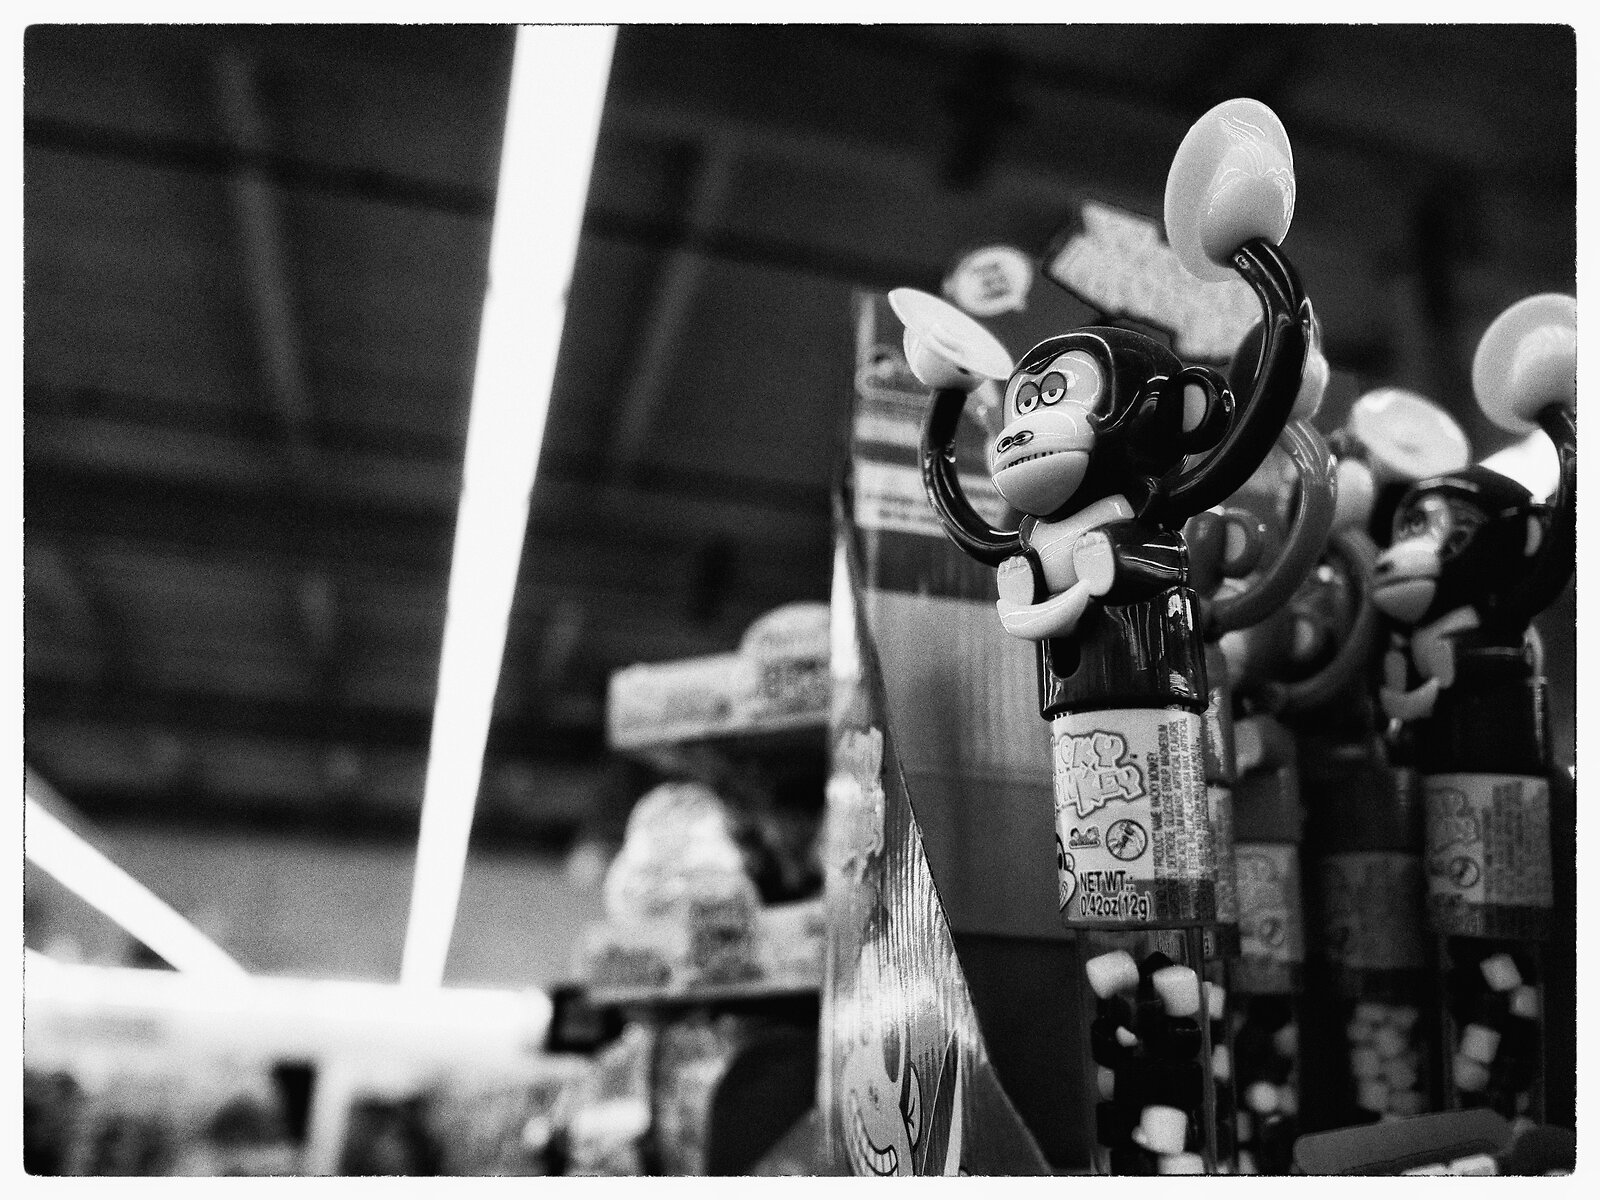 GX9_Jun21_21_Supermarket_Tricky_Monkey.jpg